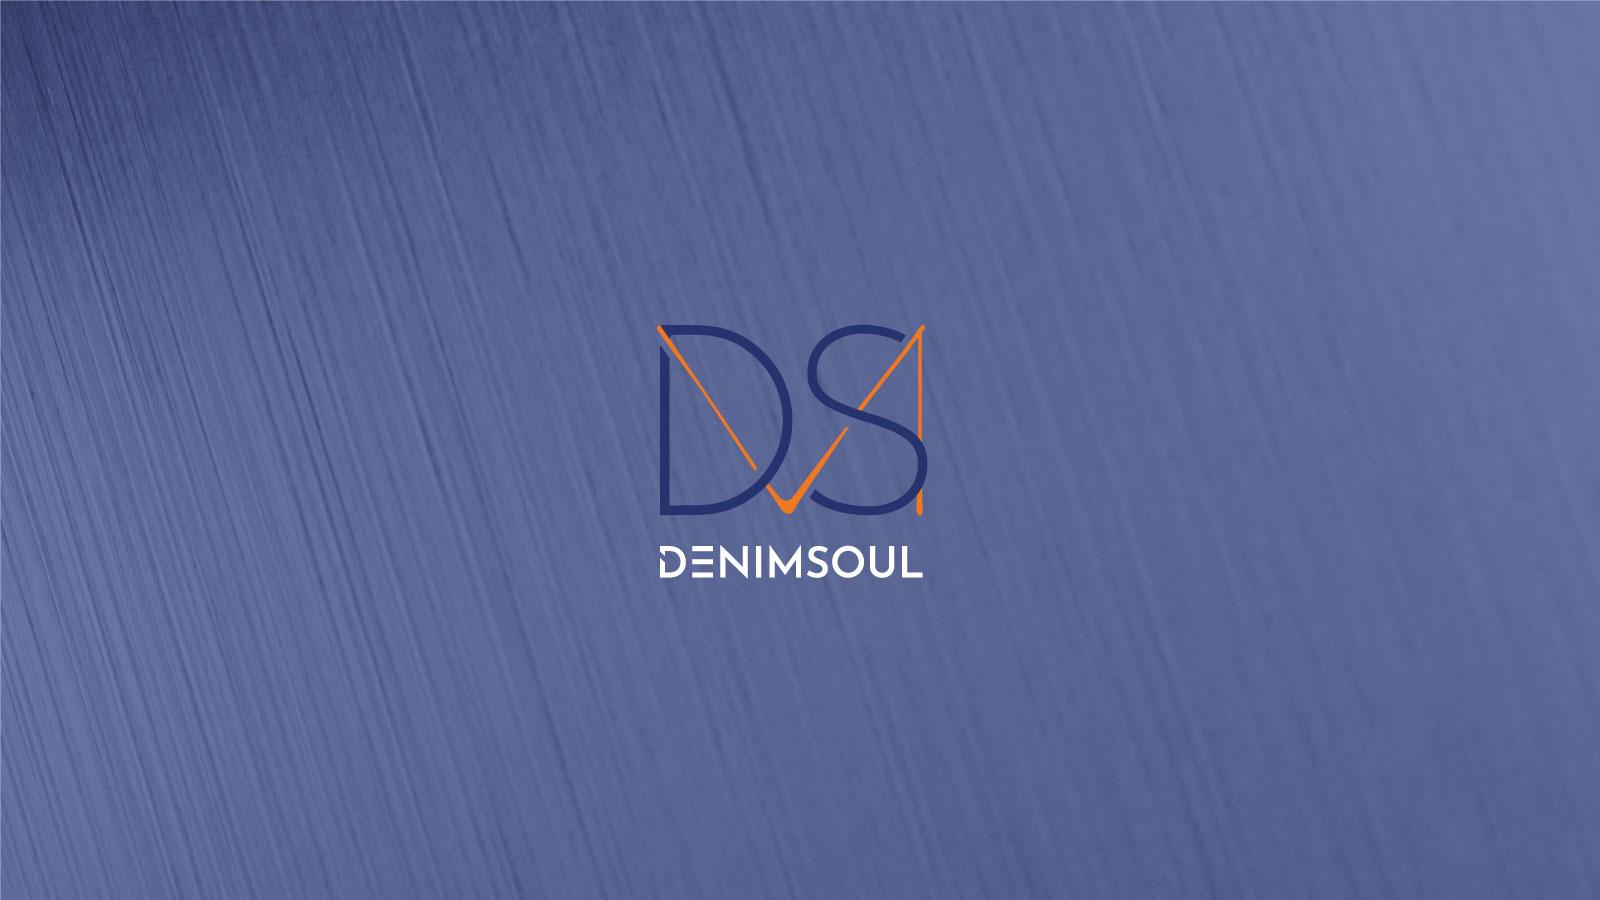 MDS Denim Soul multicolour logo on a blue overlay image background